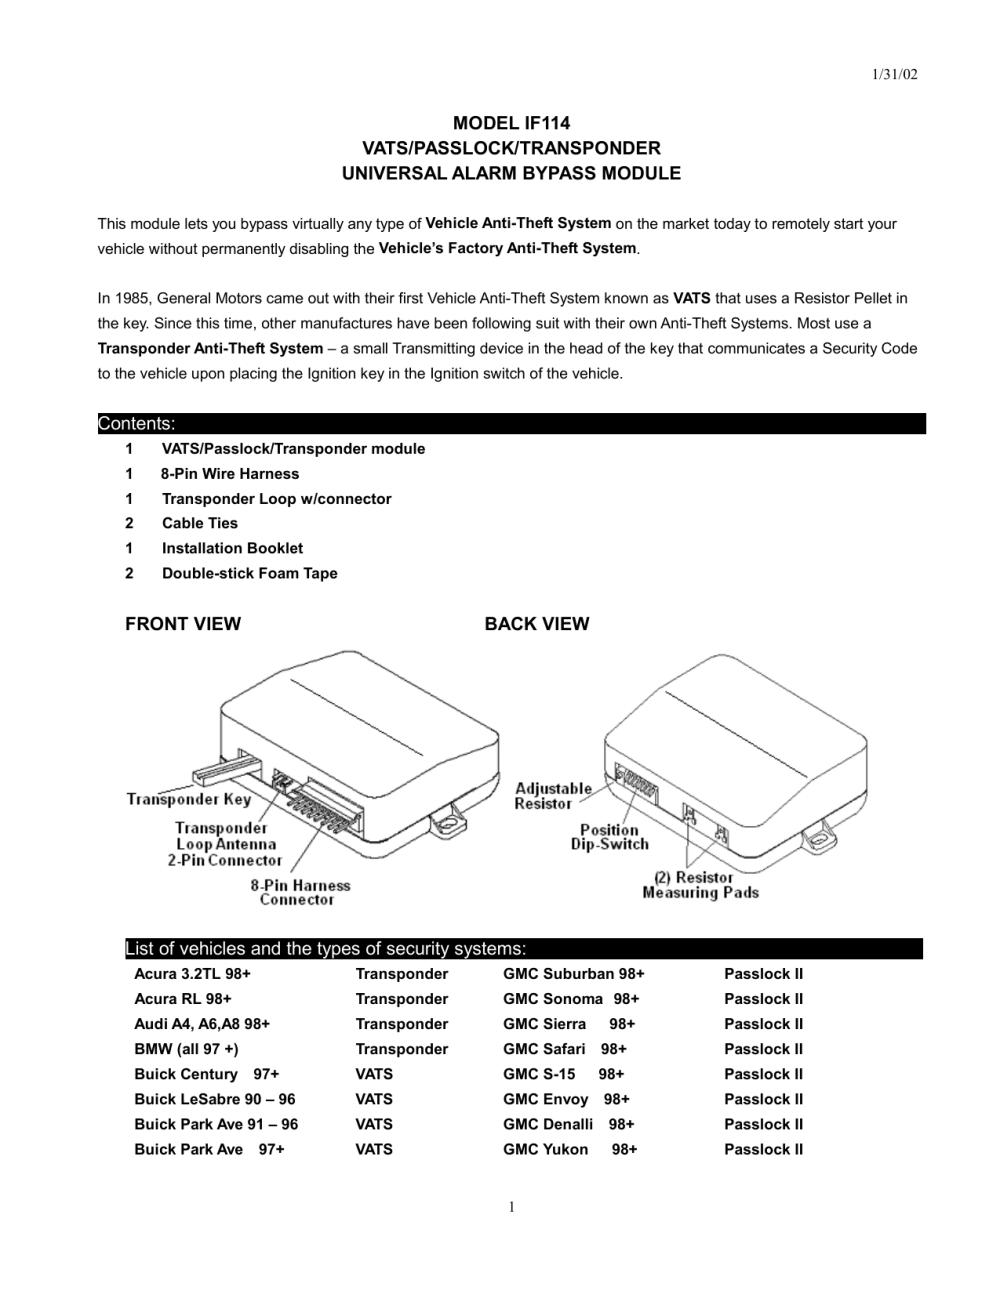 medium resolution of 97 buick lesabre vats wiring diagram wiring diagram centre 97 buick lesabre vats wiring diagram